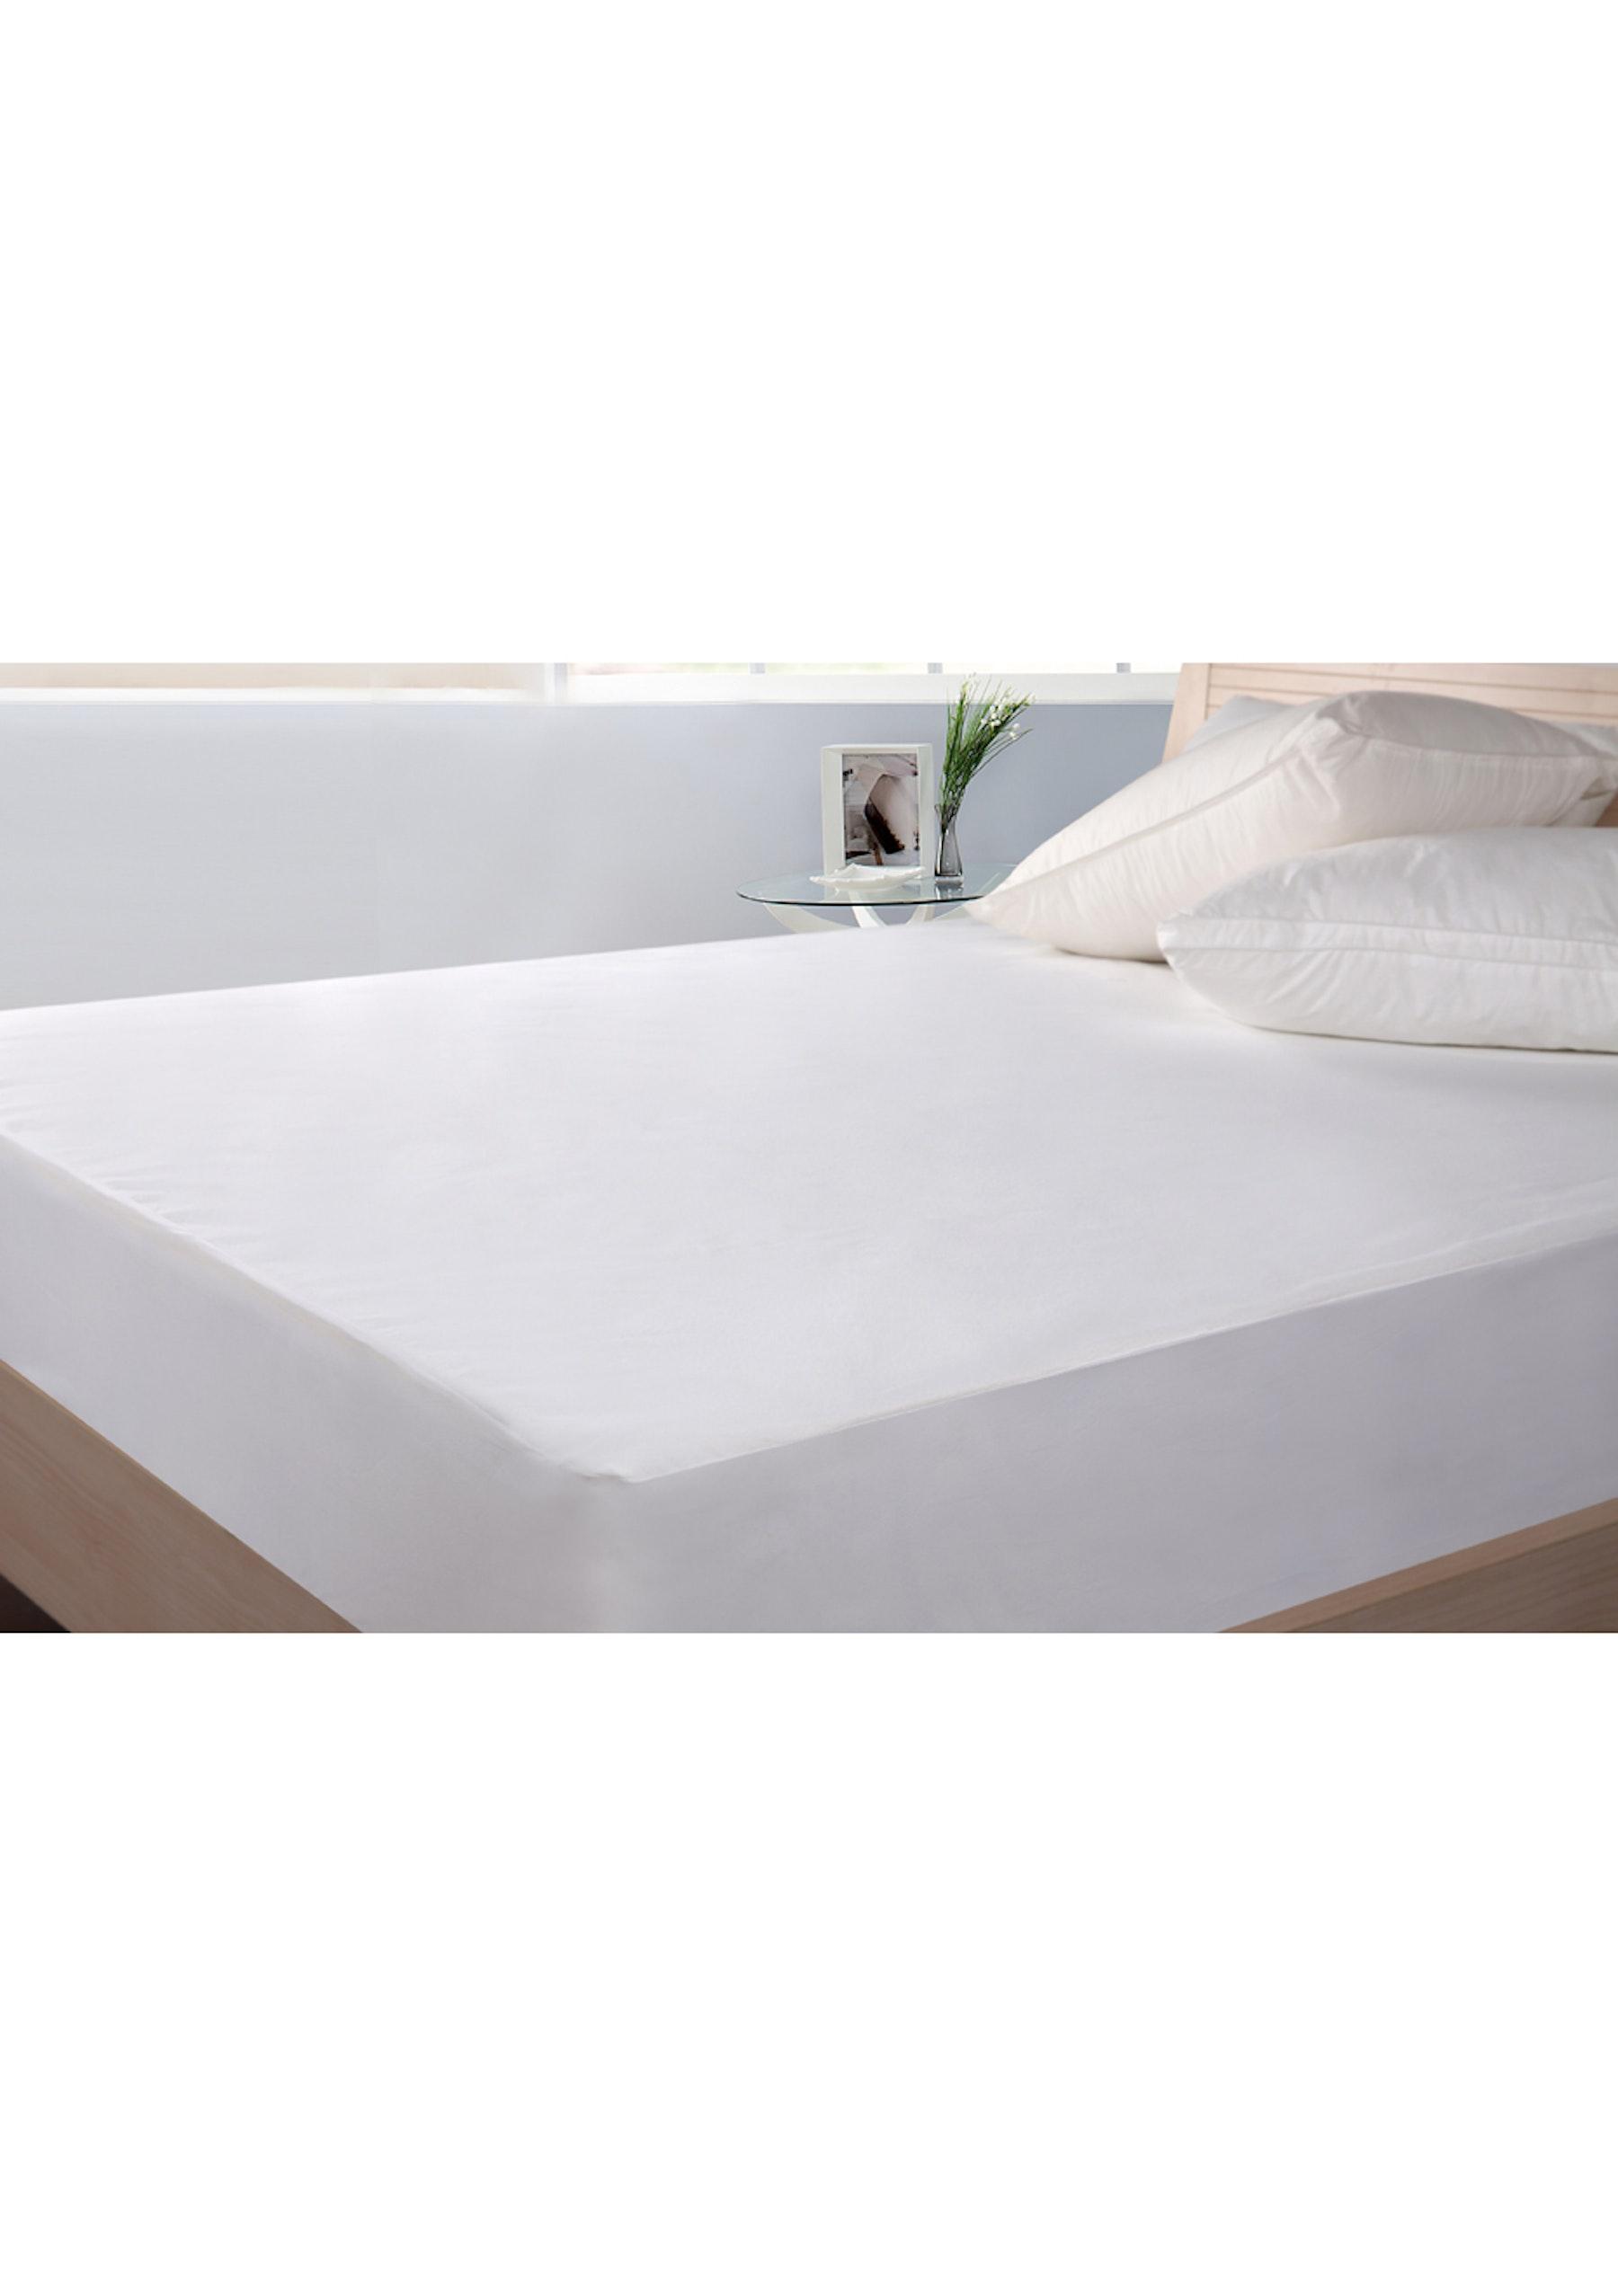 Cloudland Double Bed Cloudland Waterproof Mattress Protector